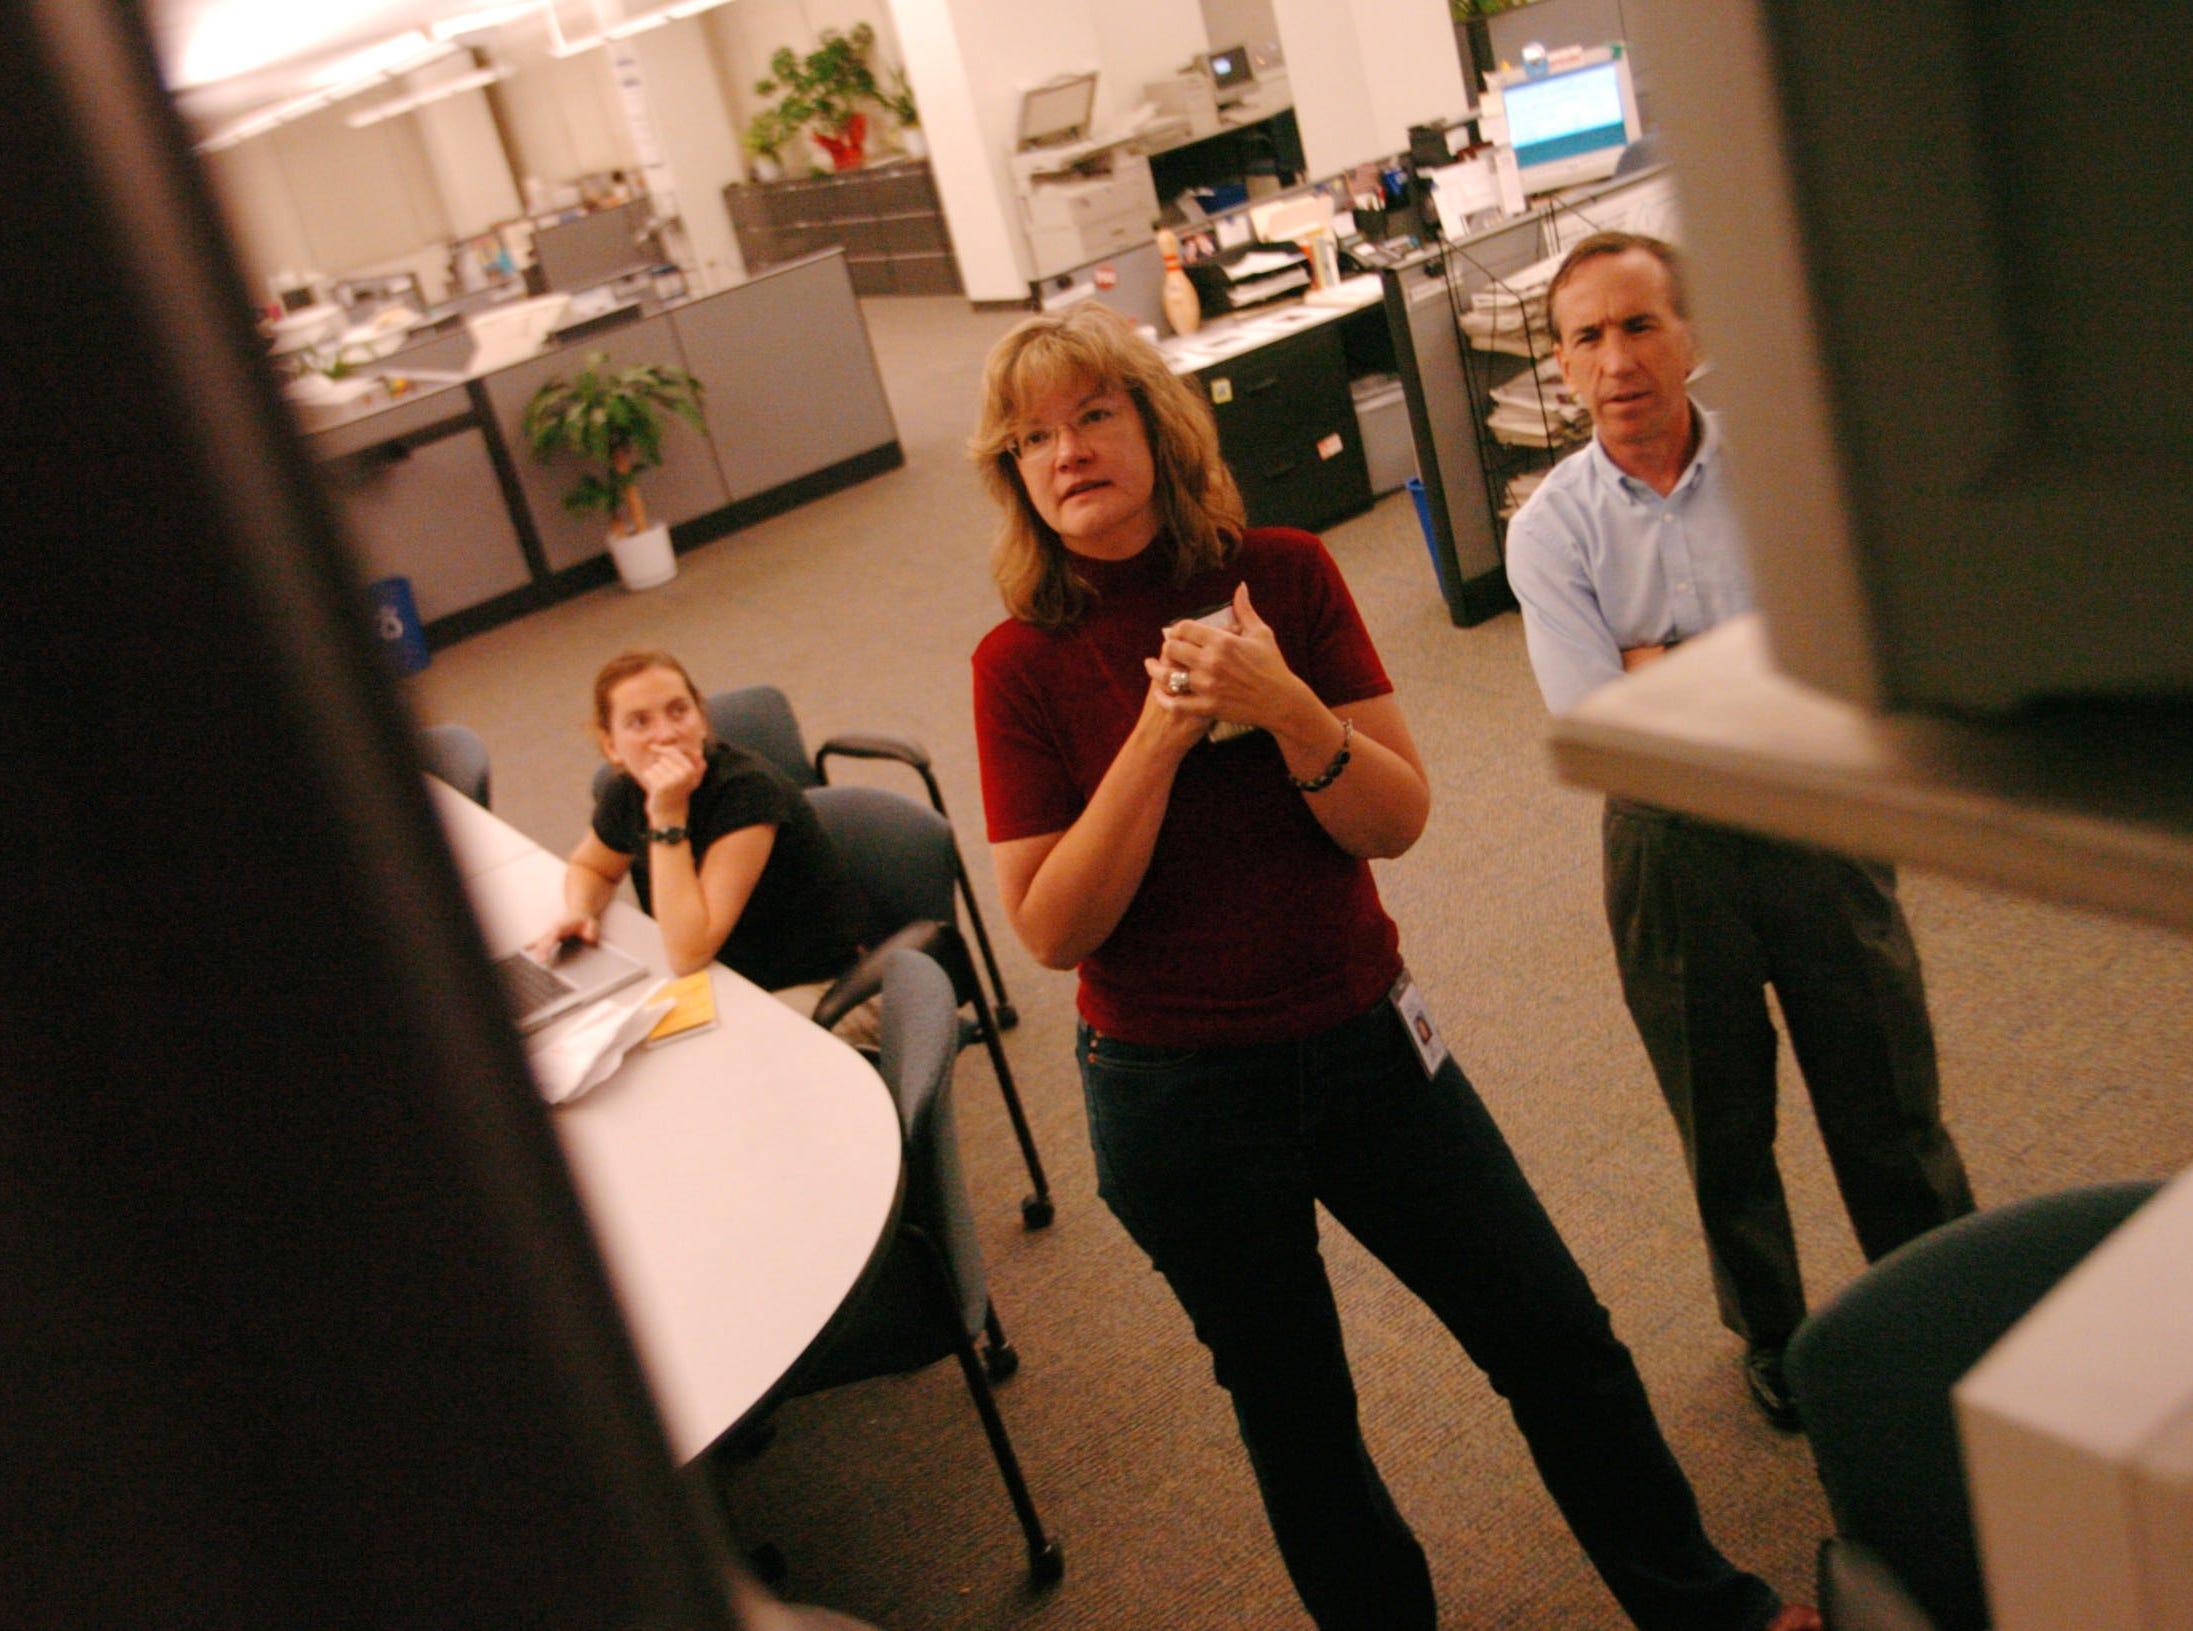 Amy Smotherman, Lara Edge, Jack McElroy watching results.  11/3/04